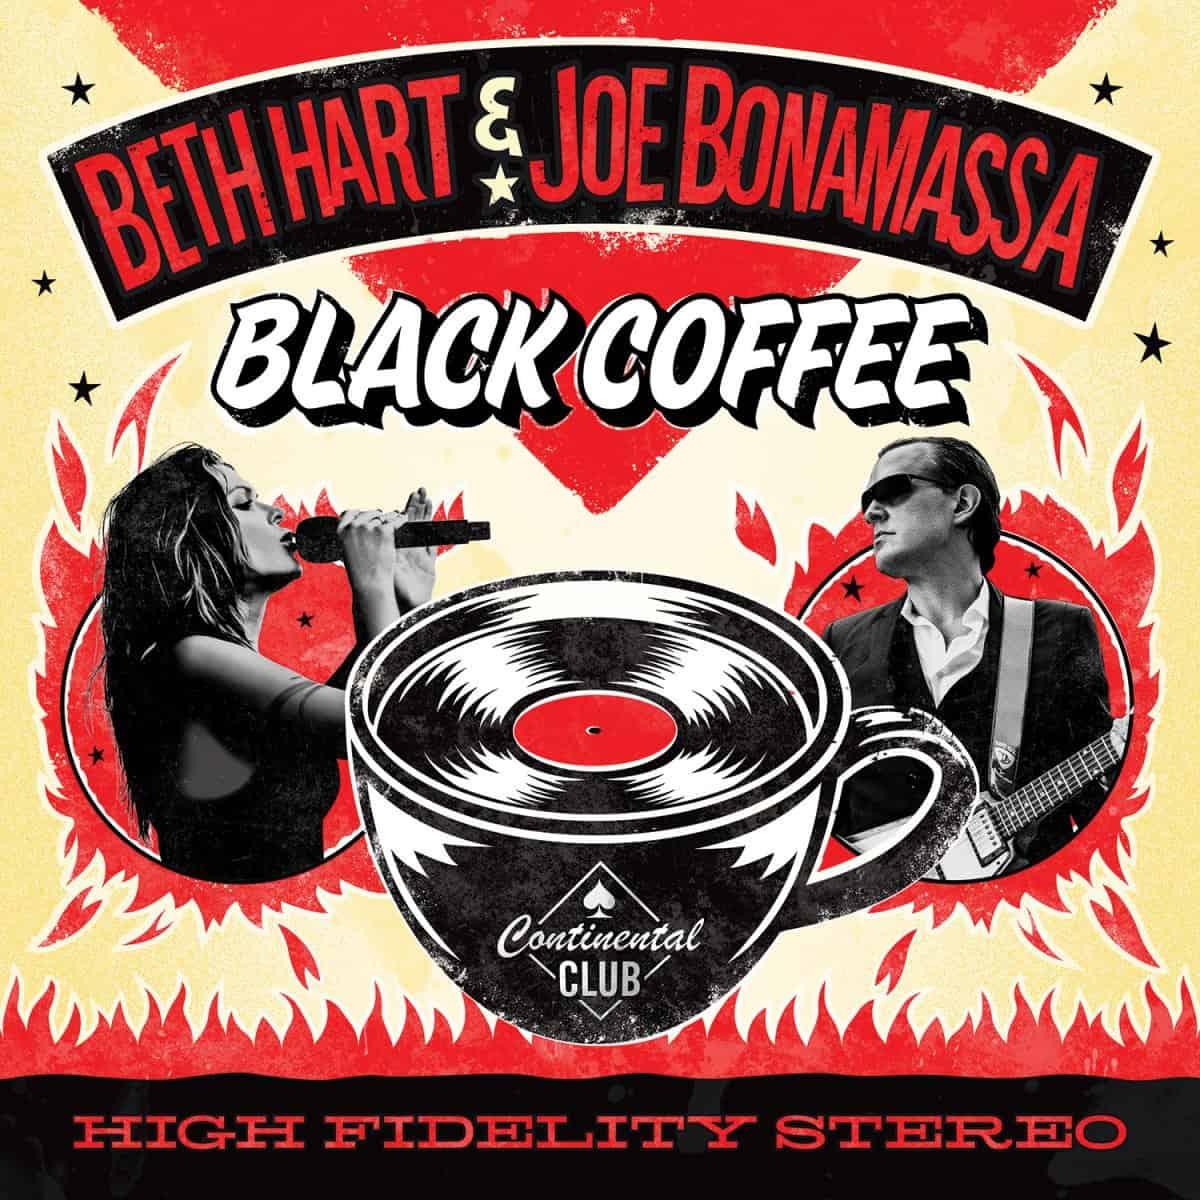 Beth-Hart-and-Joe-Bonamassa-Black-Coffee-1-1200x1200.jpg